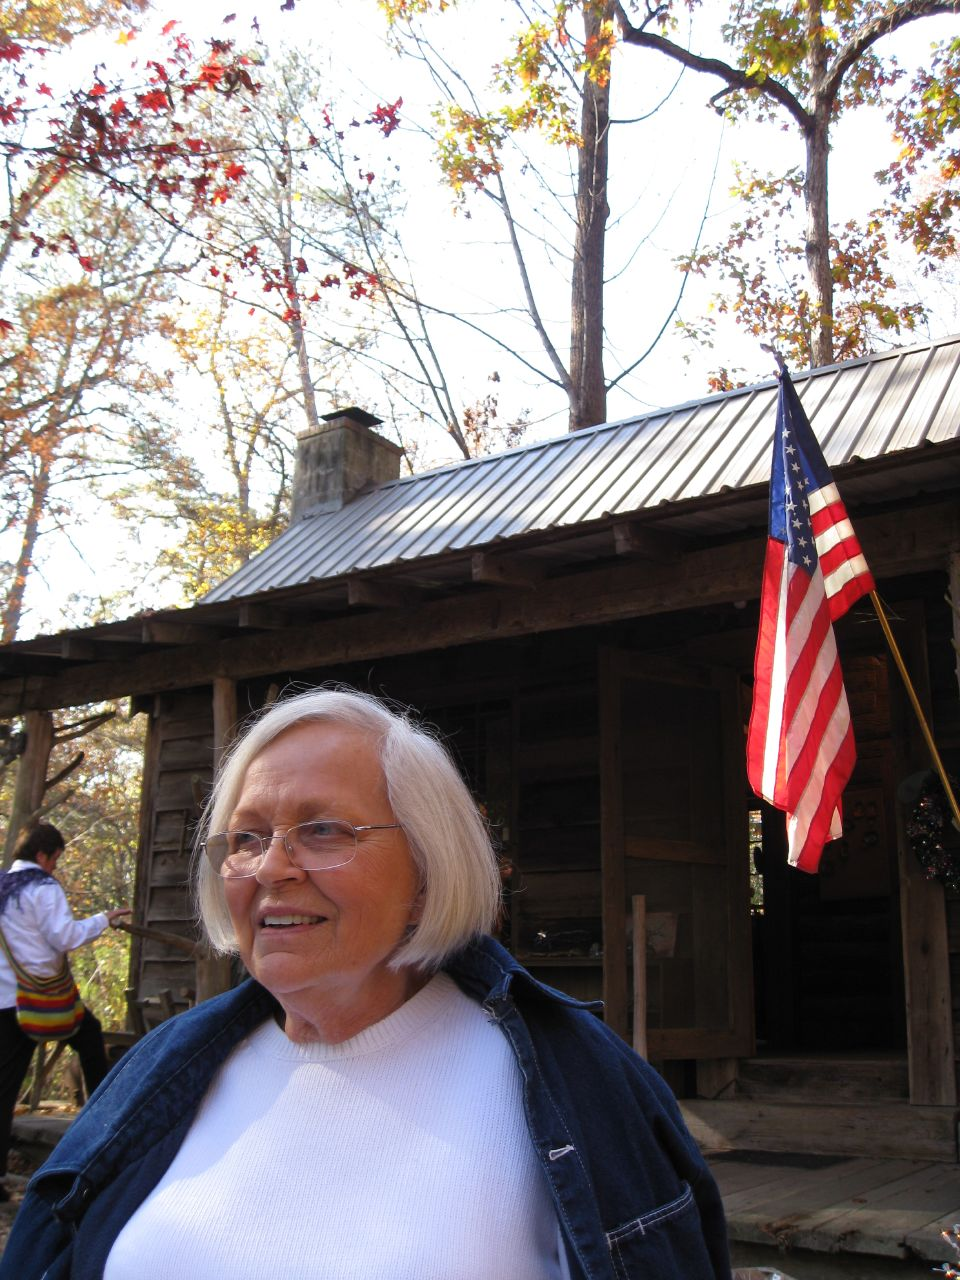 Grandma and Cabin